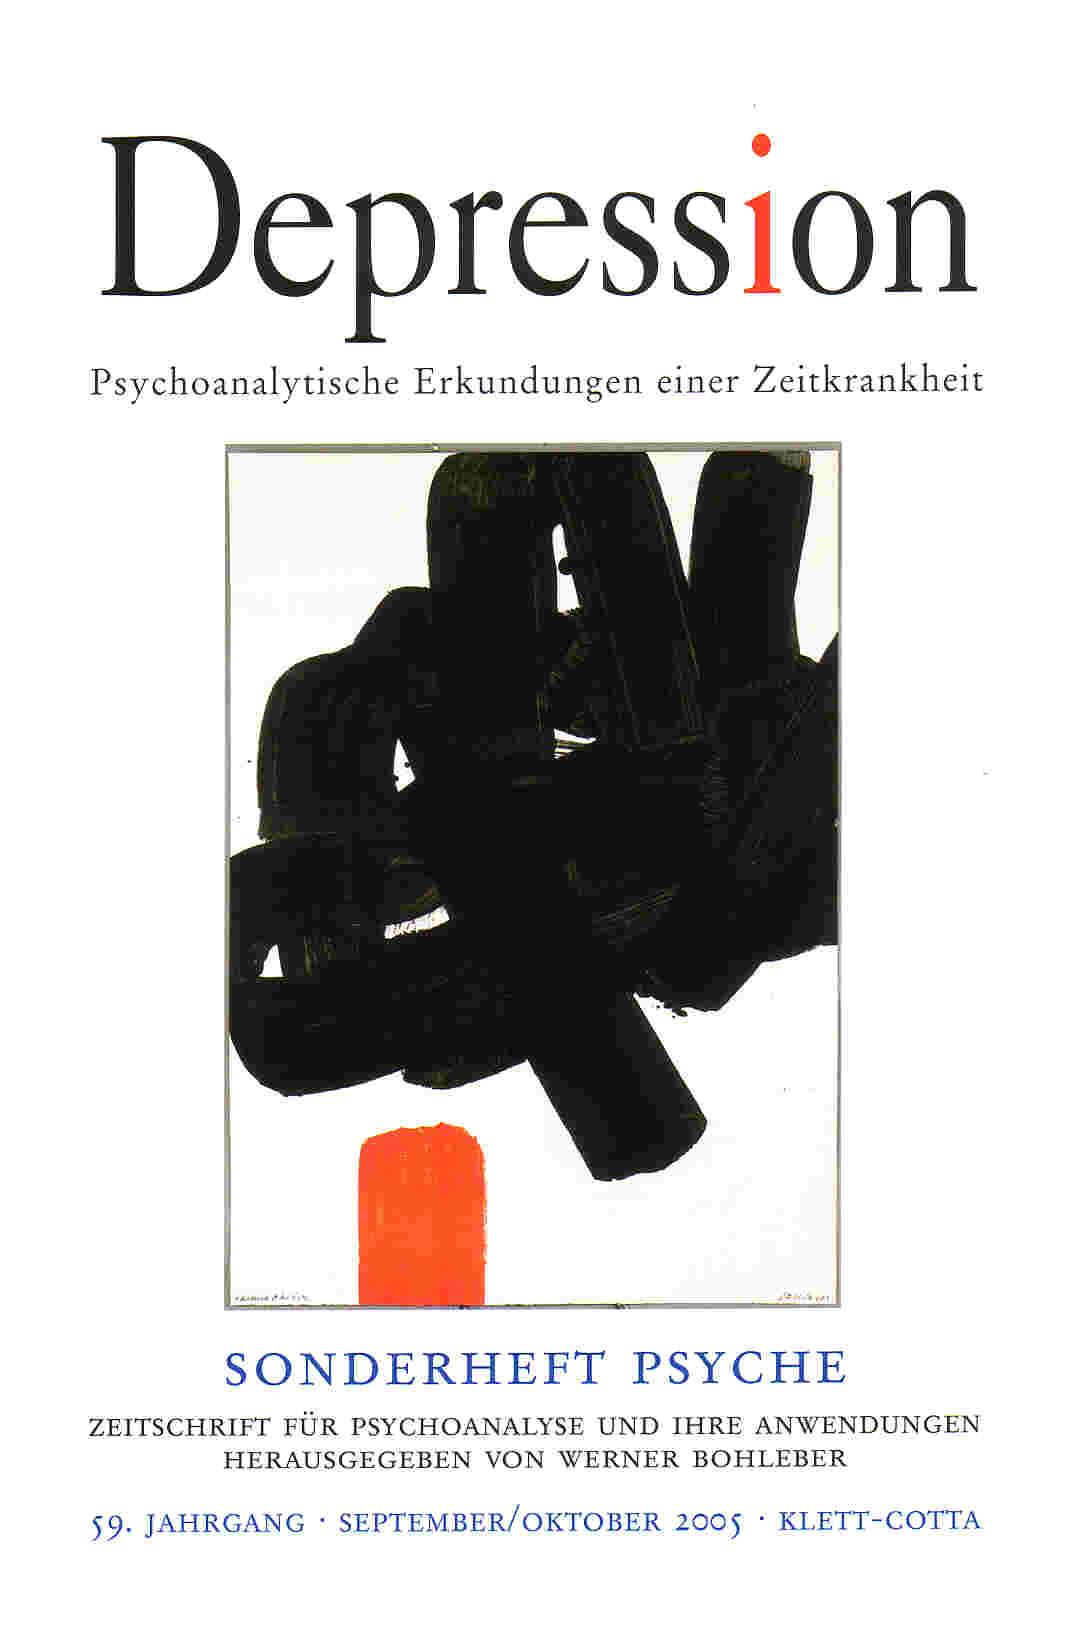 Bücher, Depression, Antidepressive Therapie, Suizid, Antidepressiva ...